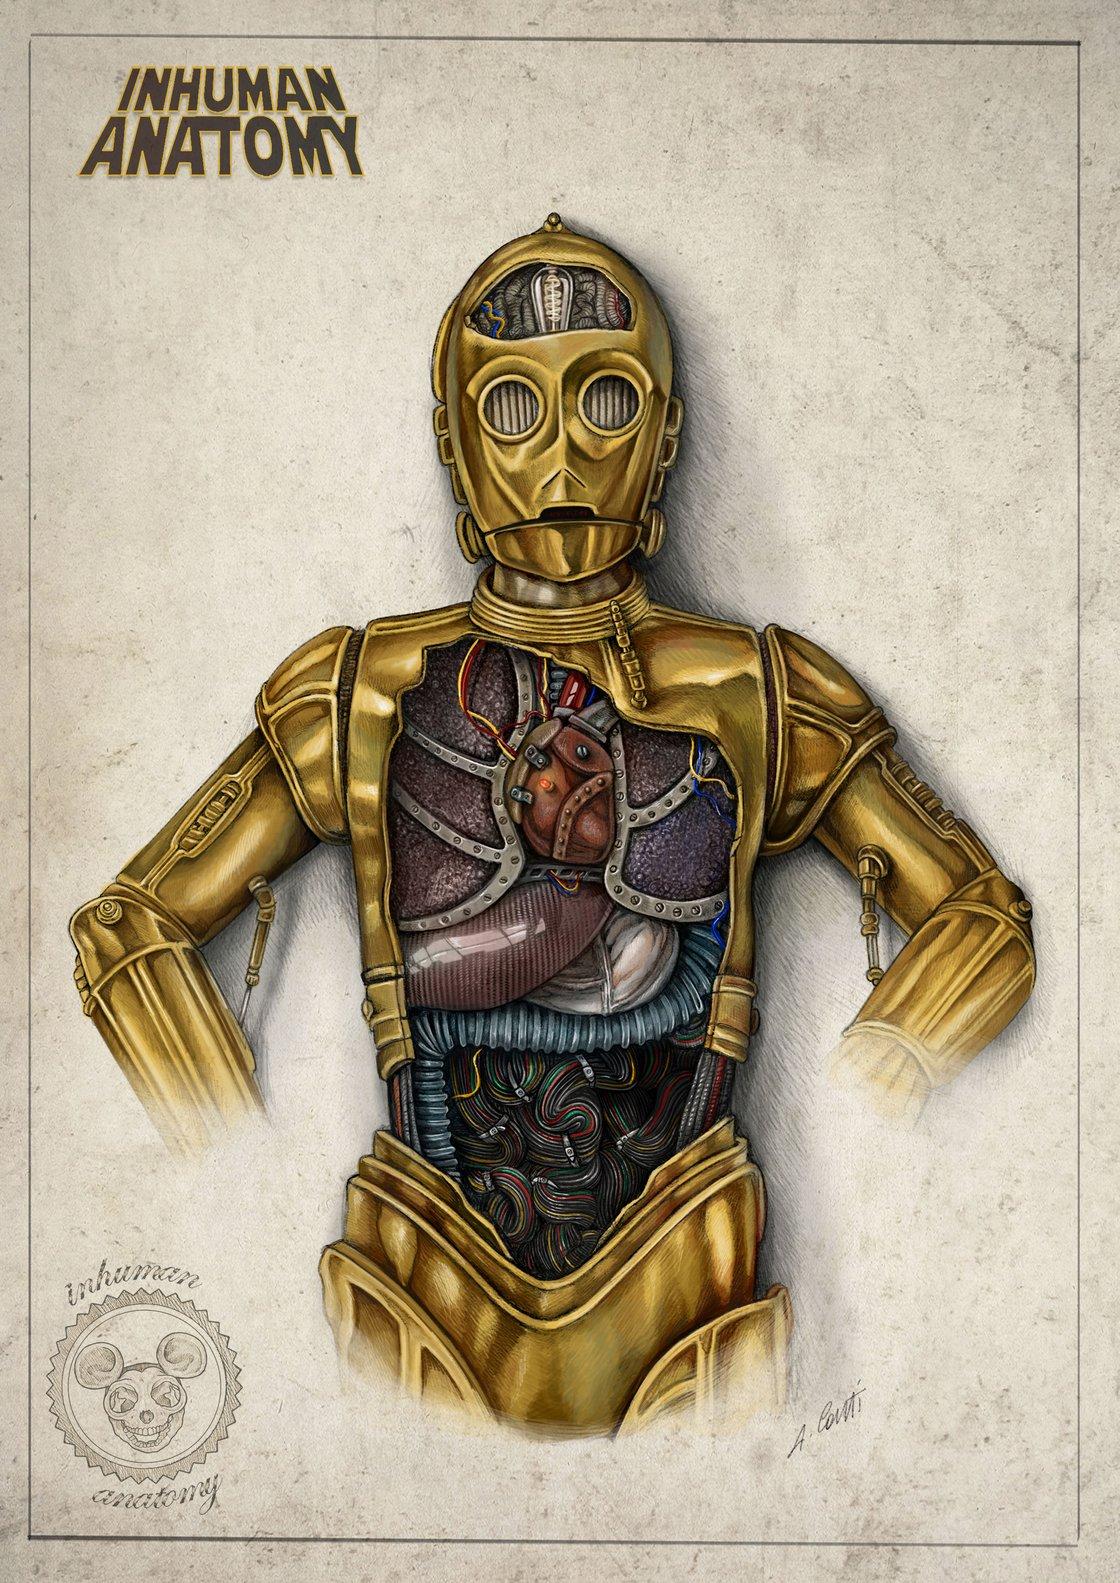 Image of INHUMAN ANATOMY- C-3PO - limited edition of 40 Giclèe print on fine art canvas